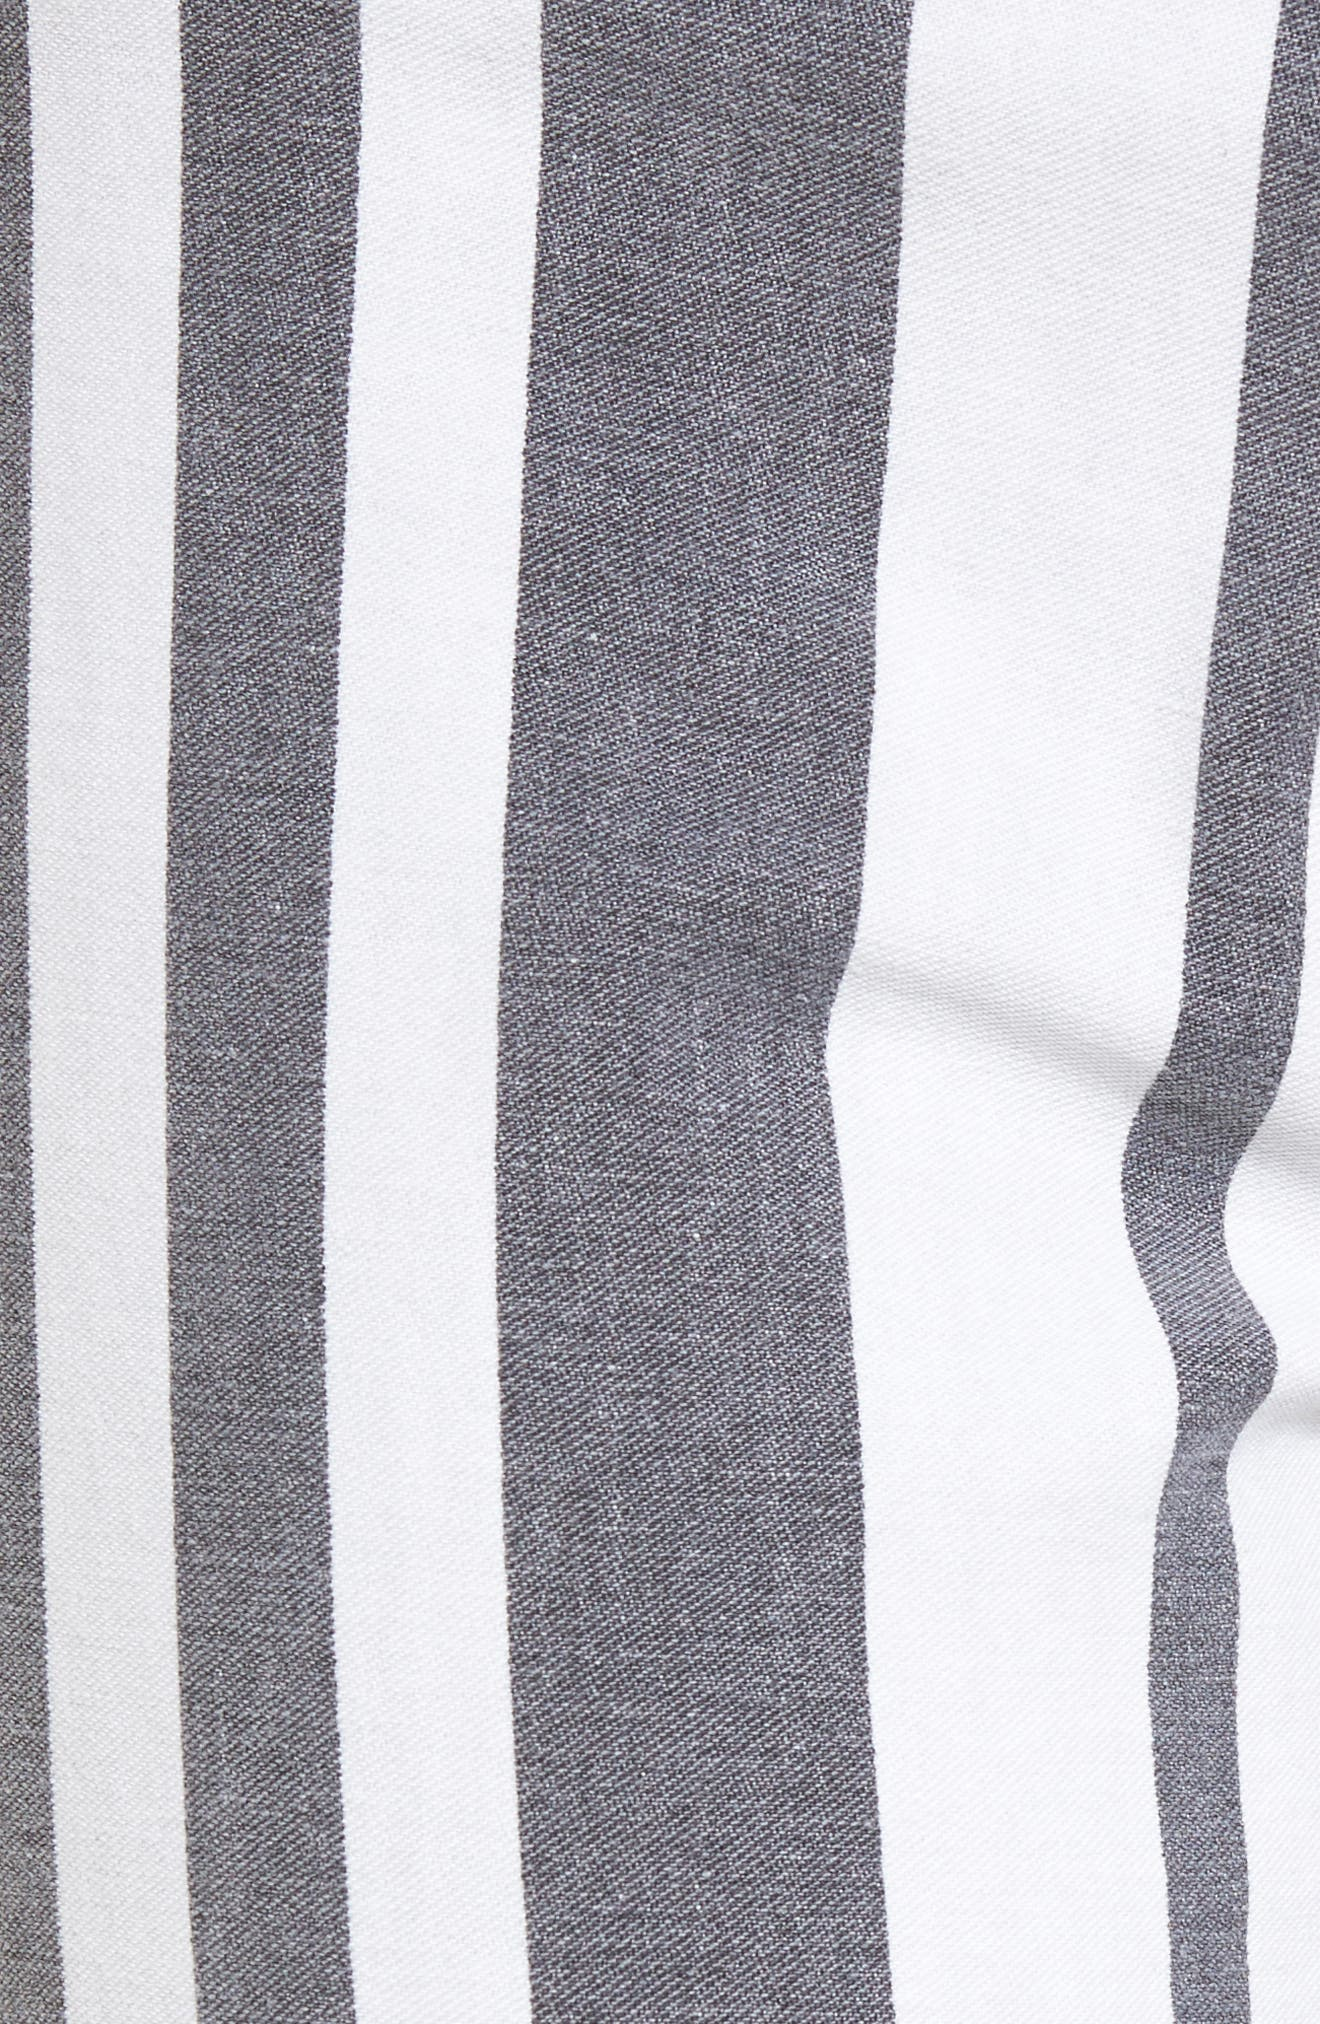 Barbara High Waist Ankle Super Skinny Jeans,                             Alternate thumbnail 5, color,                             Undertaking